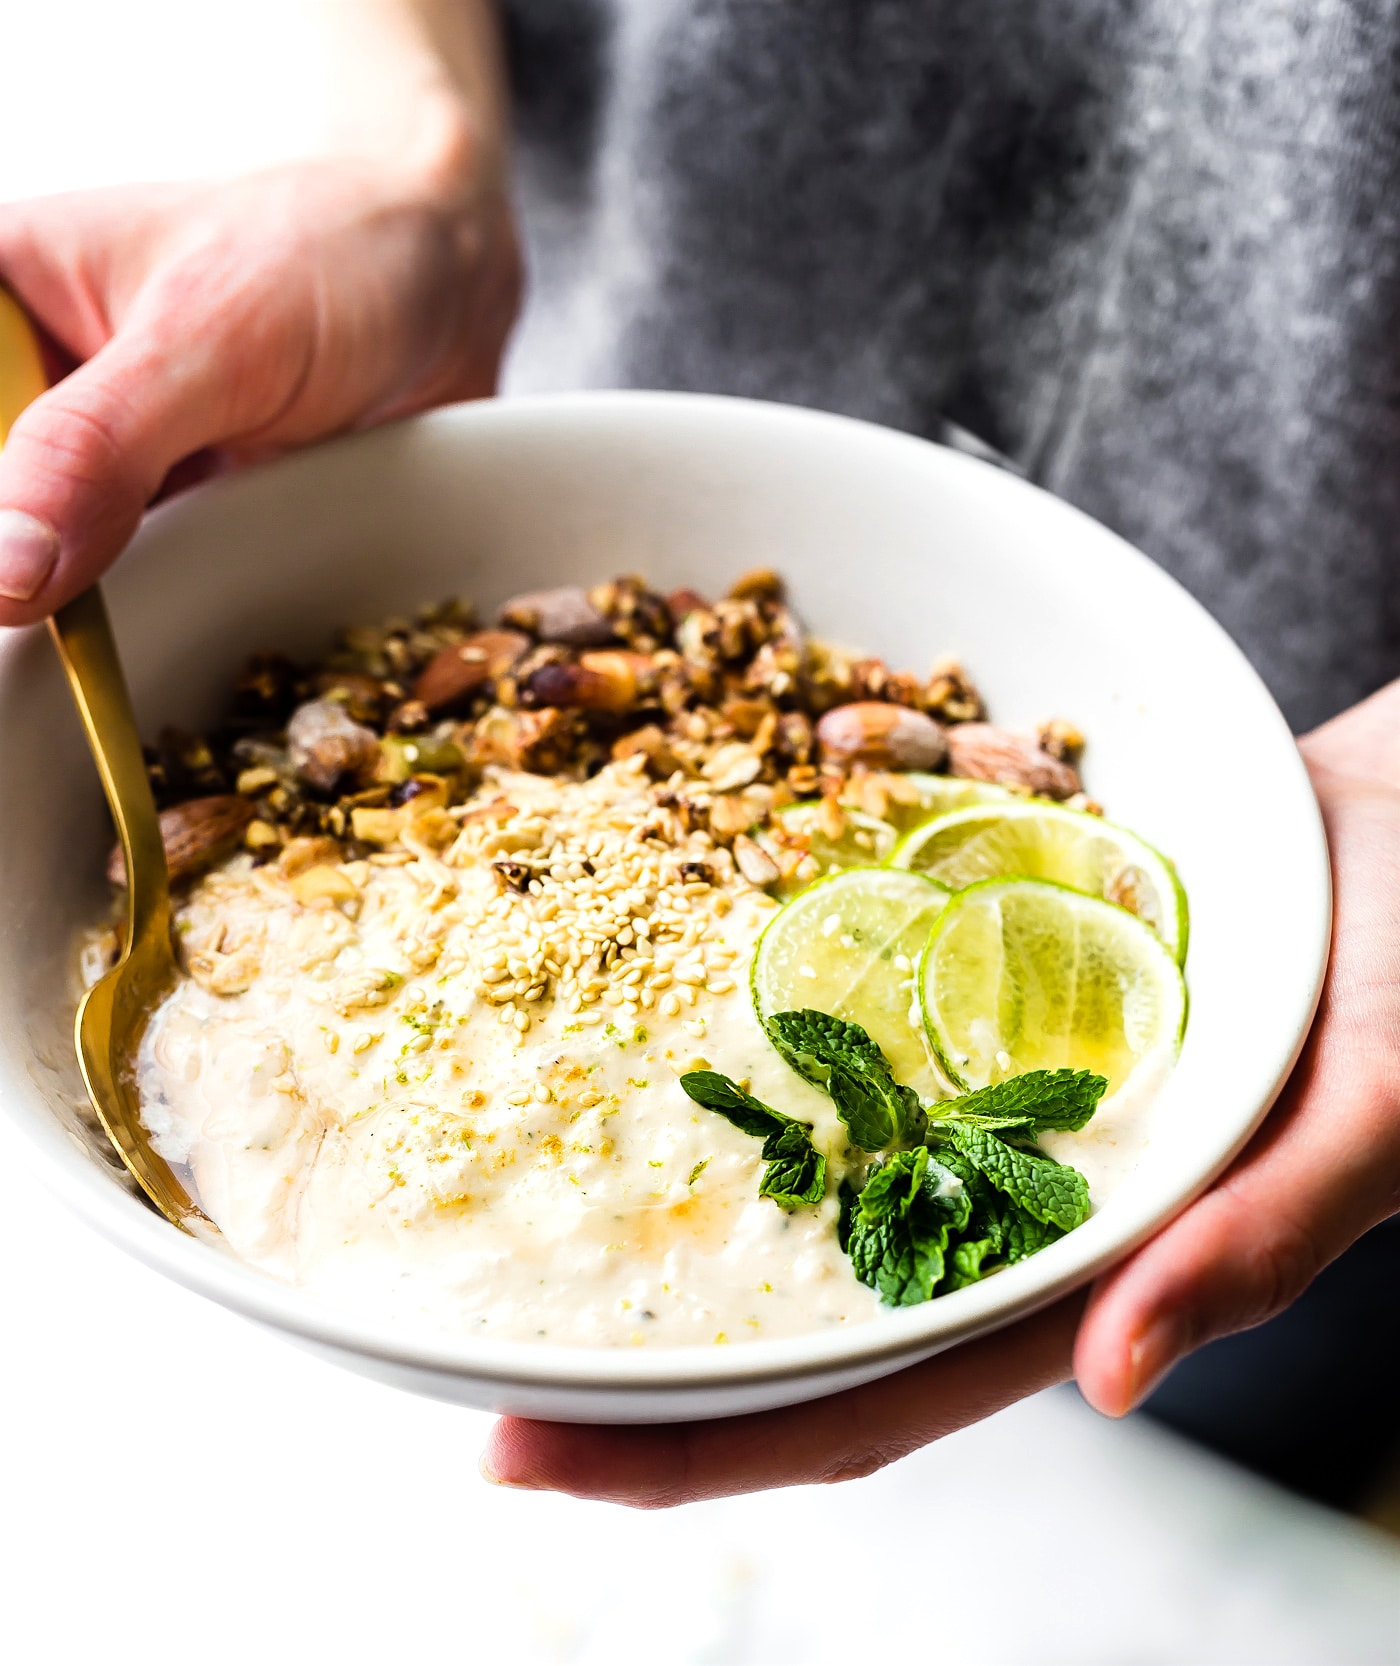 Zesty Tropical Yogurt Overnight Muesli Bowls {Gluten Free}